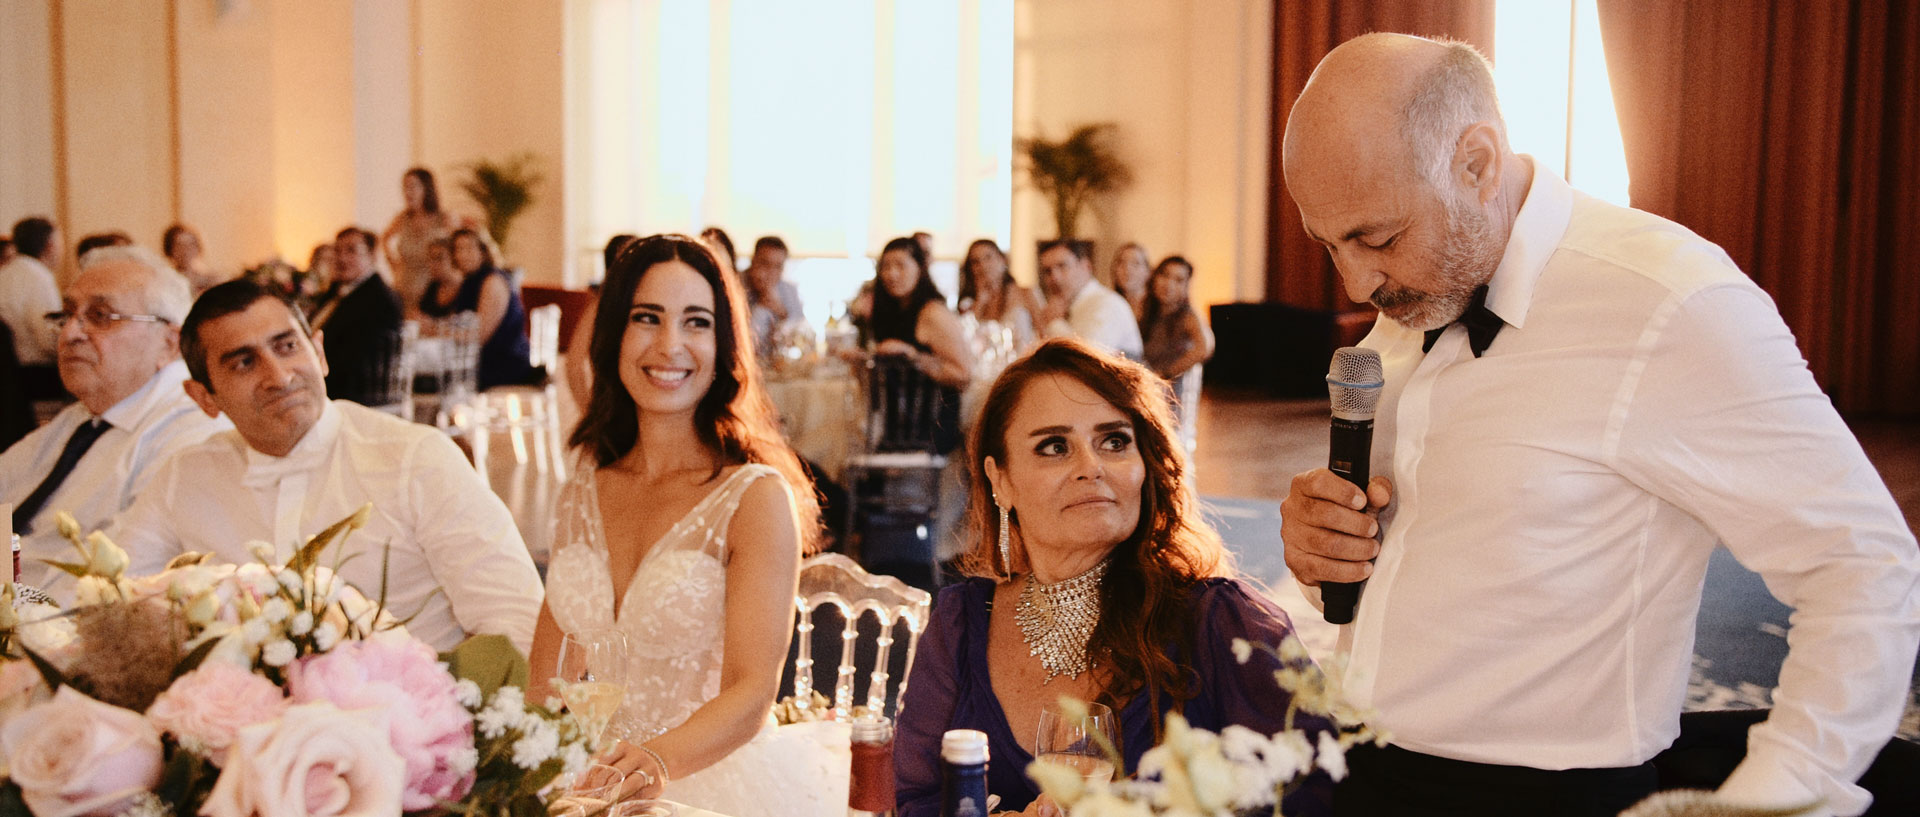 Natasha & Jad Wedding - Casino Biarritz (30).jpg